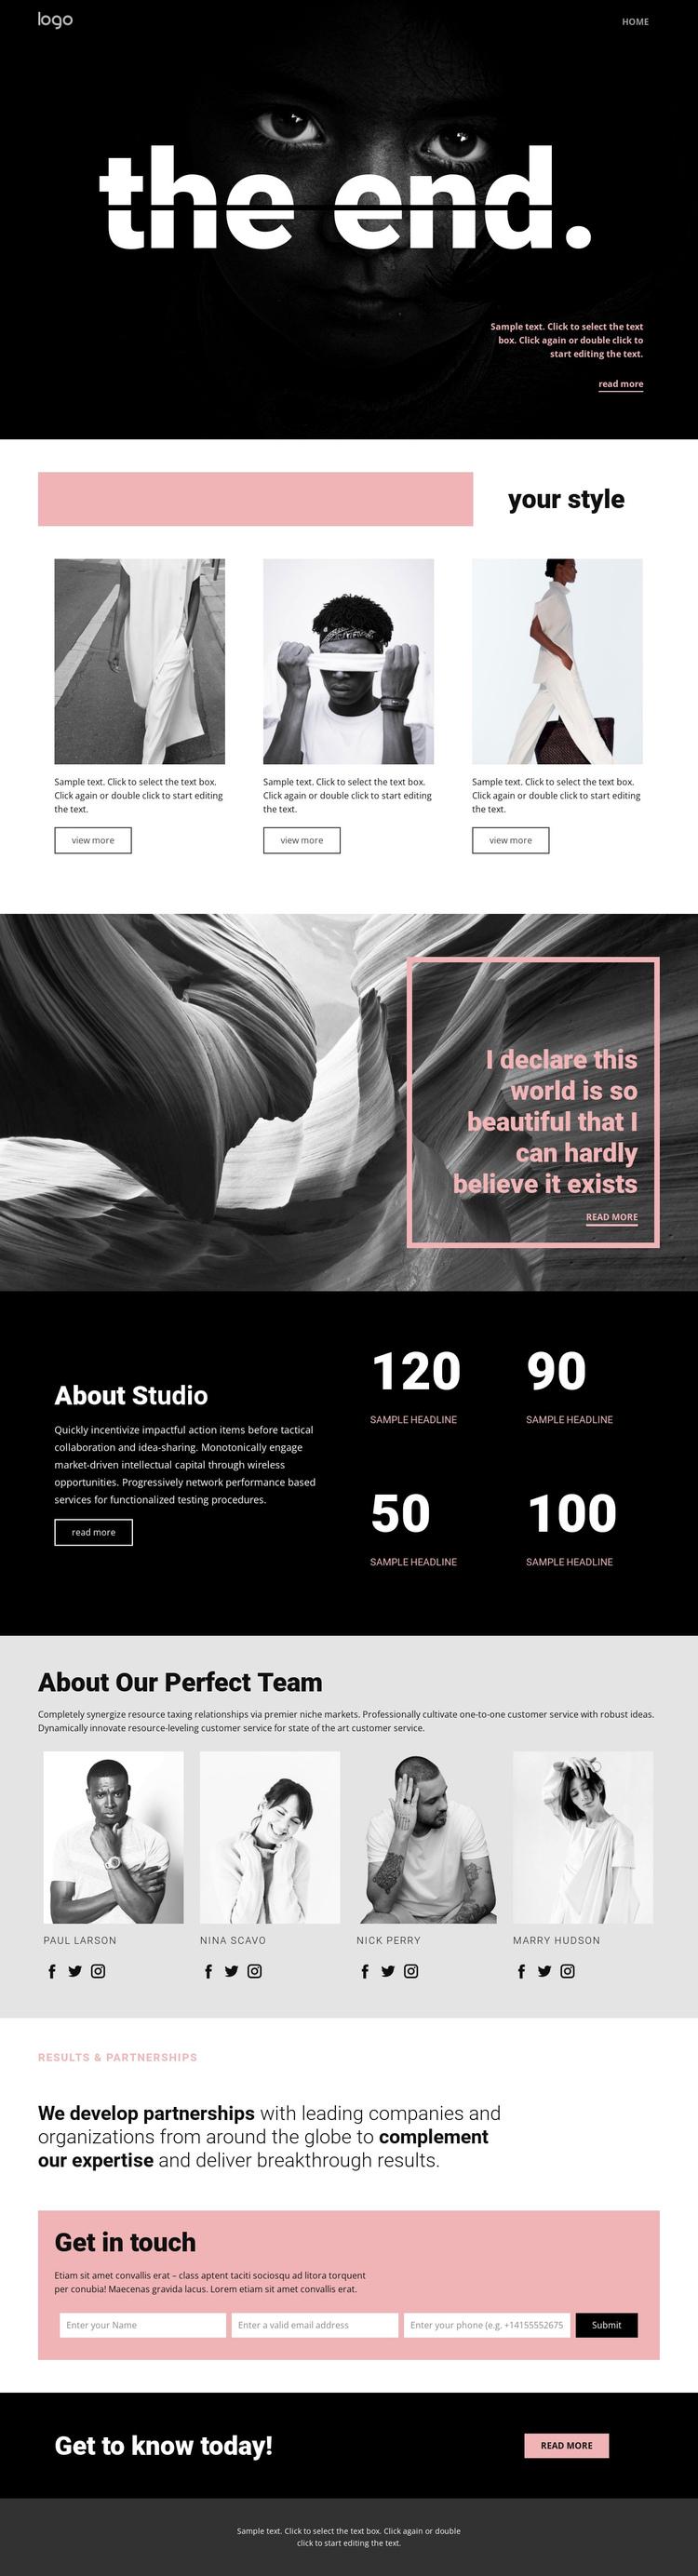 Perfecting styles of art Website Builder Software